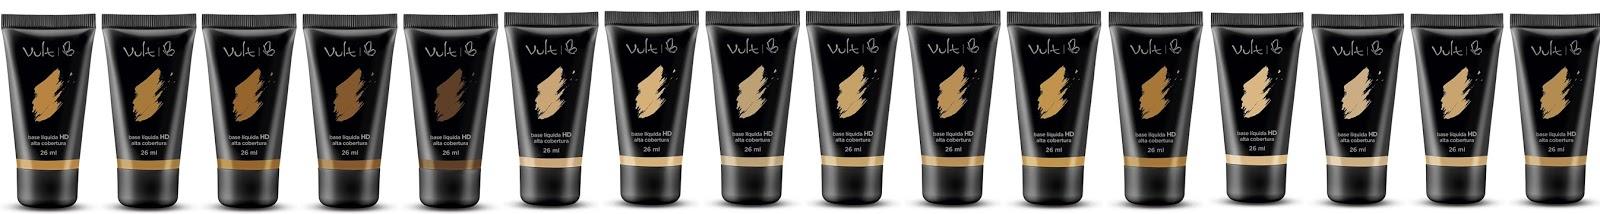 Base líquida, base efeito matte, base matte, vult cosmetica, base vult, base duradoura, base alta cobertura, maquiagem, amo make, maquiagens, bases , ultra hd,